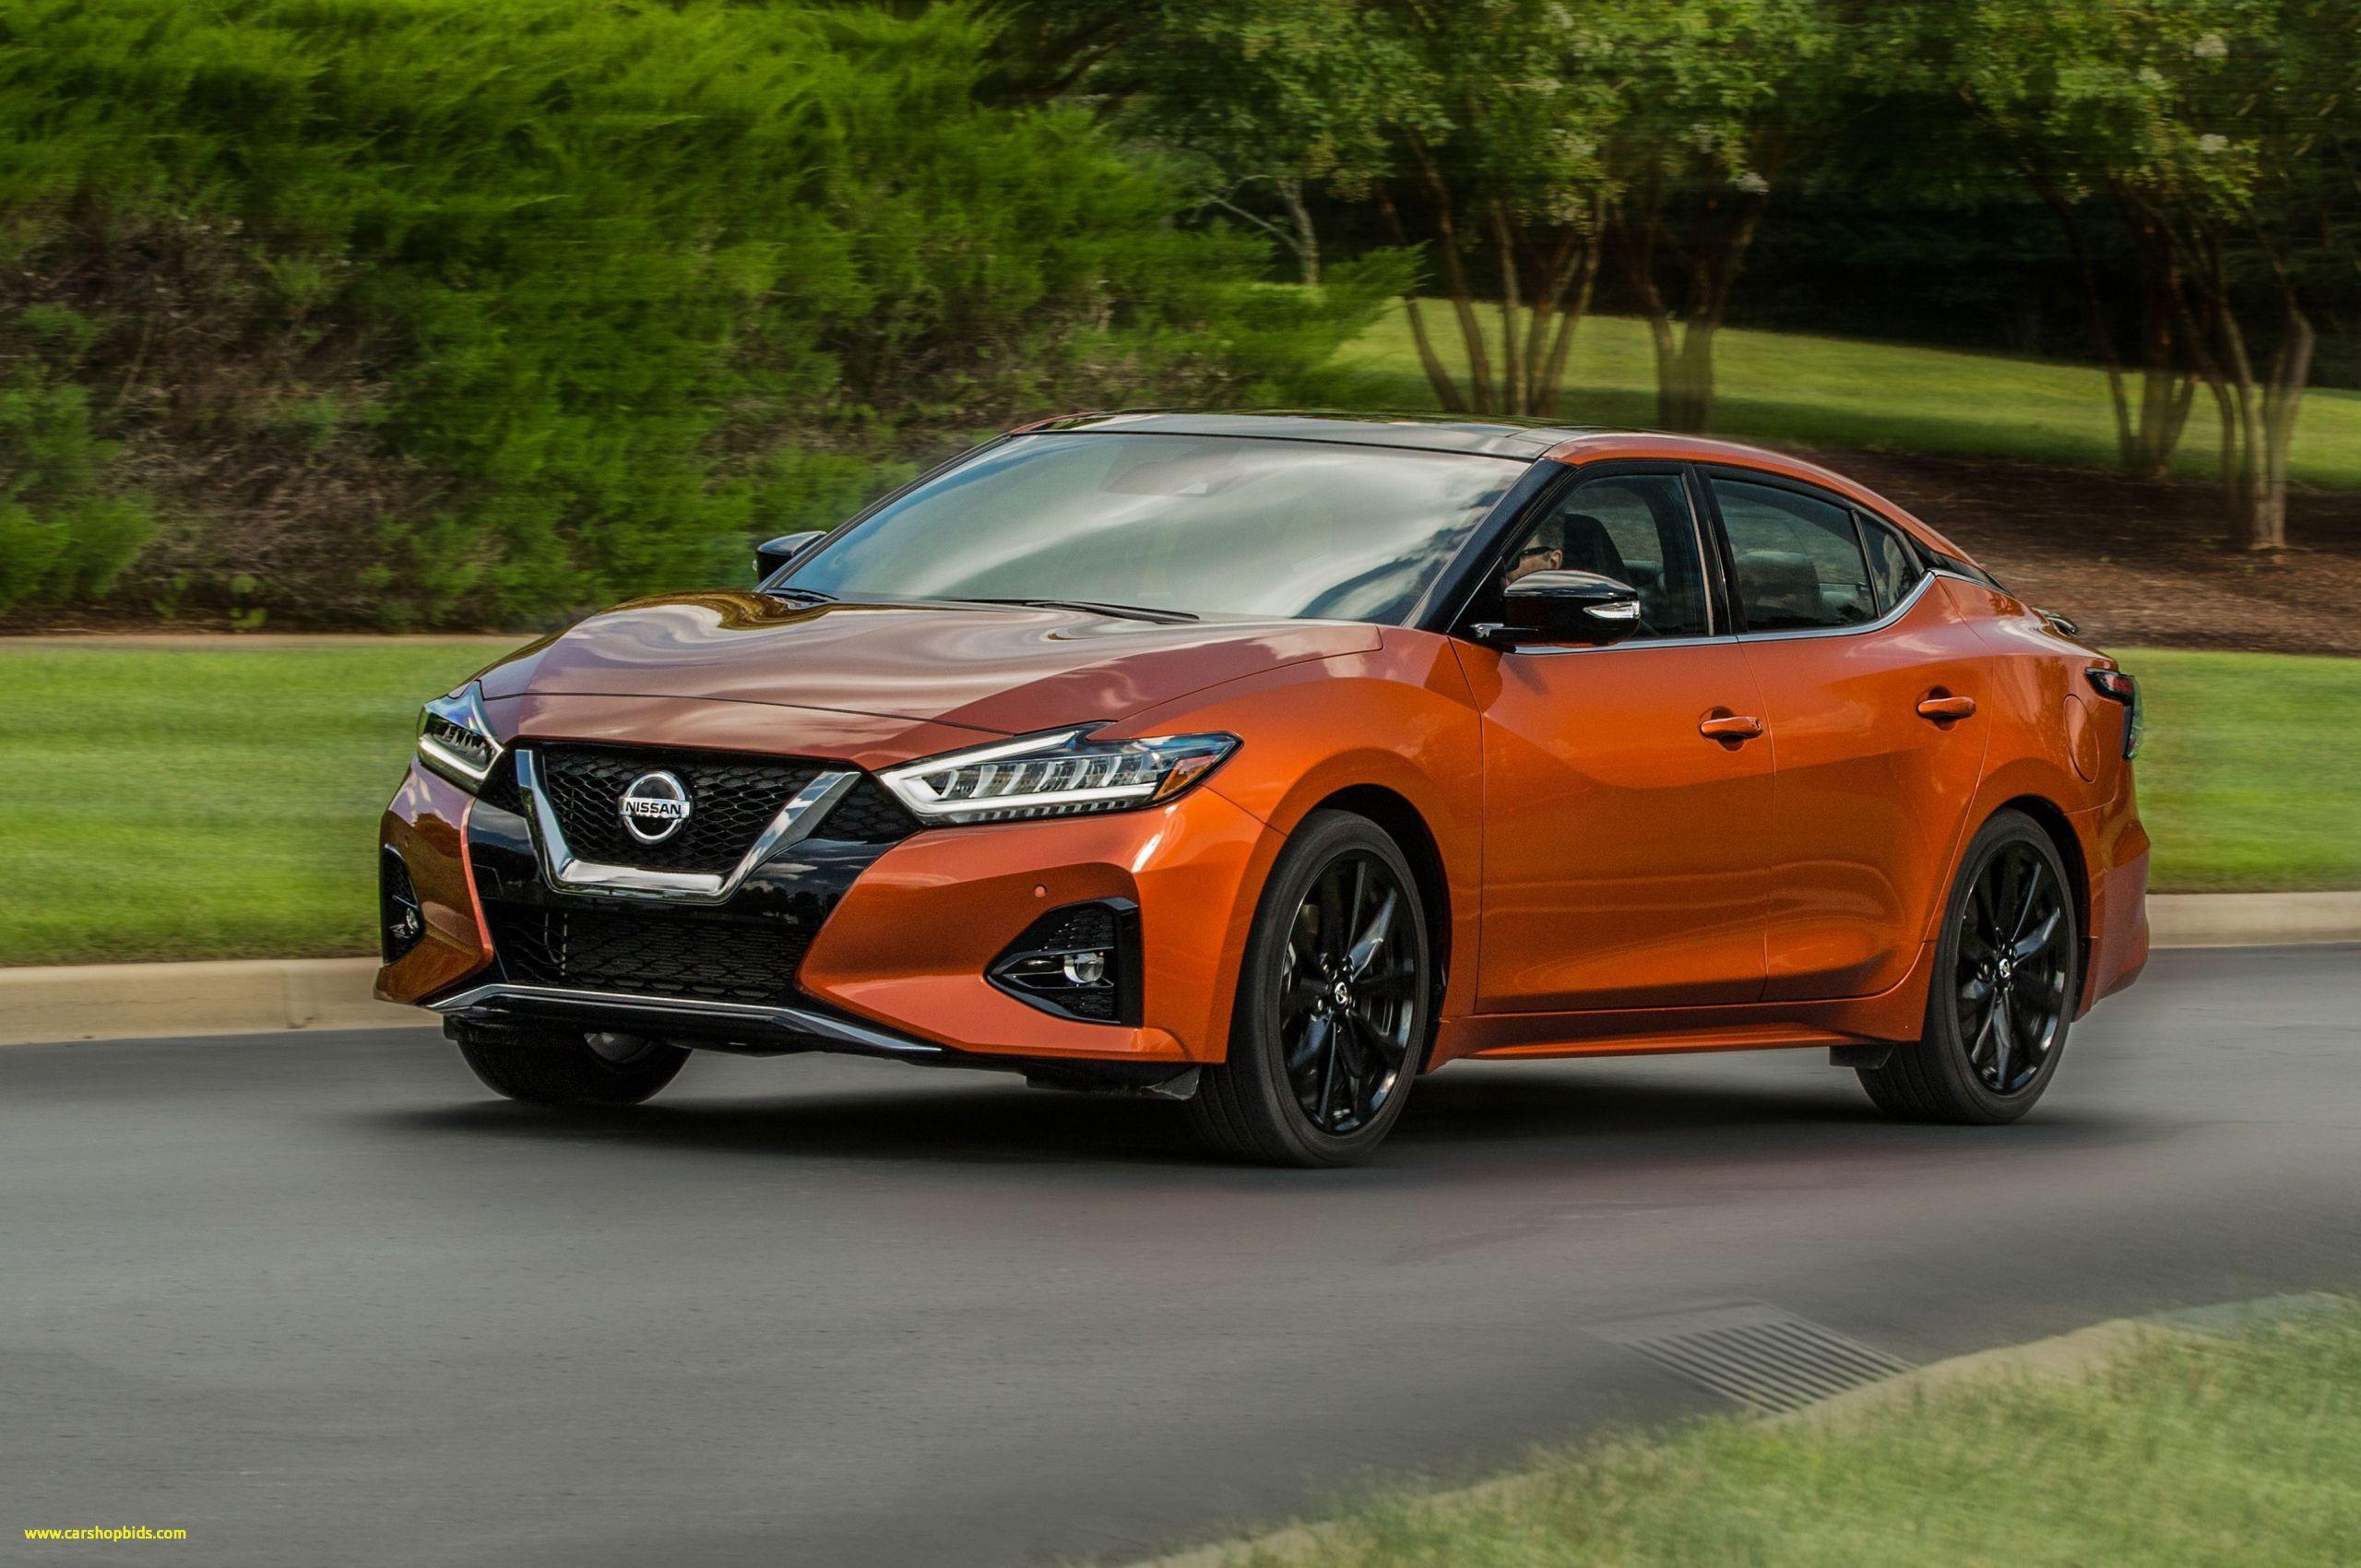 2020 Nissan Maxima 3 5 Sr 0 60 In 2020 Nissan Maxima Nissan Car